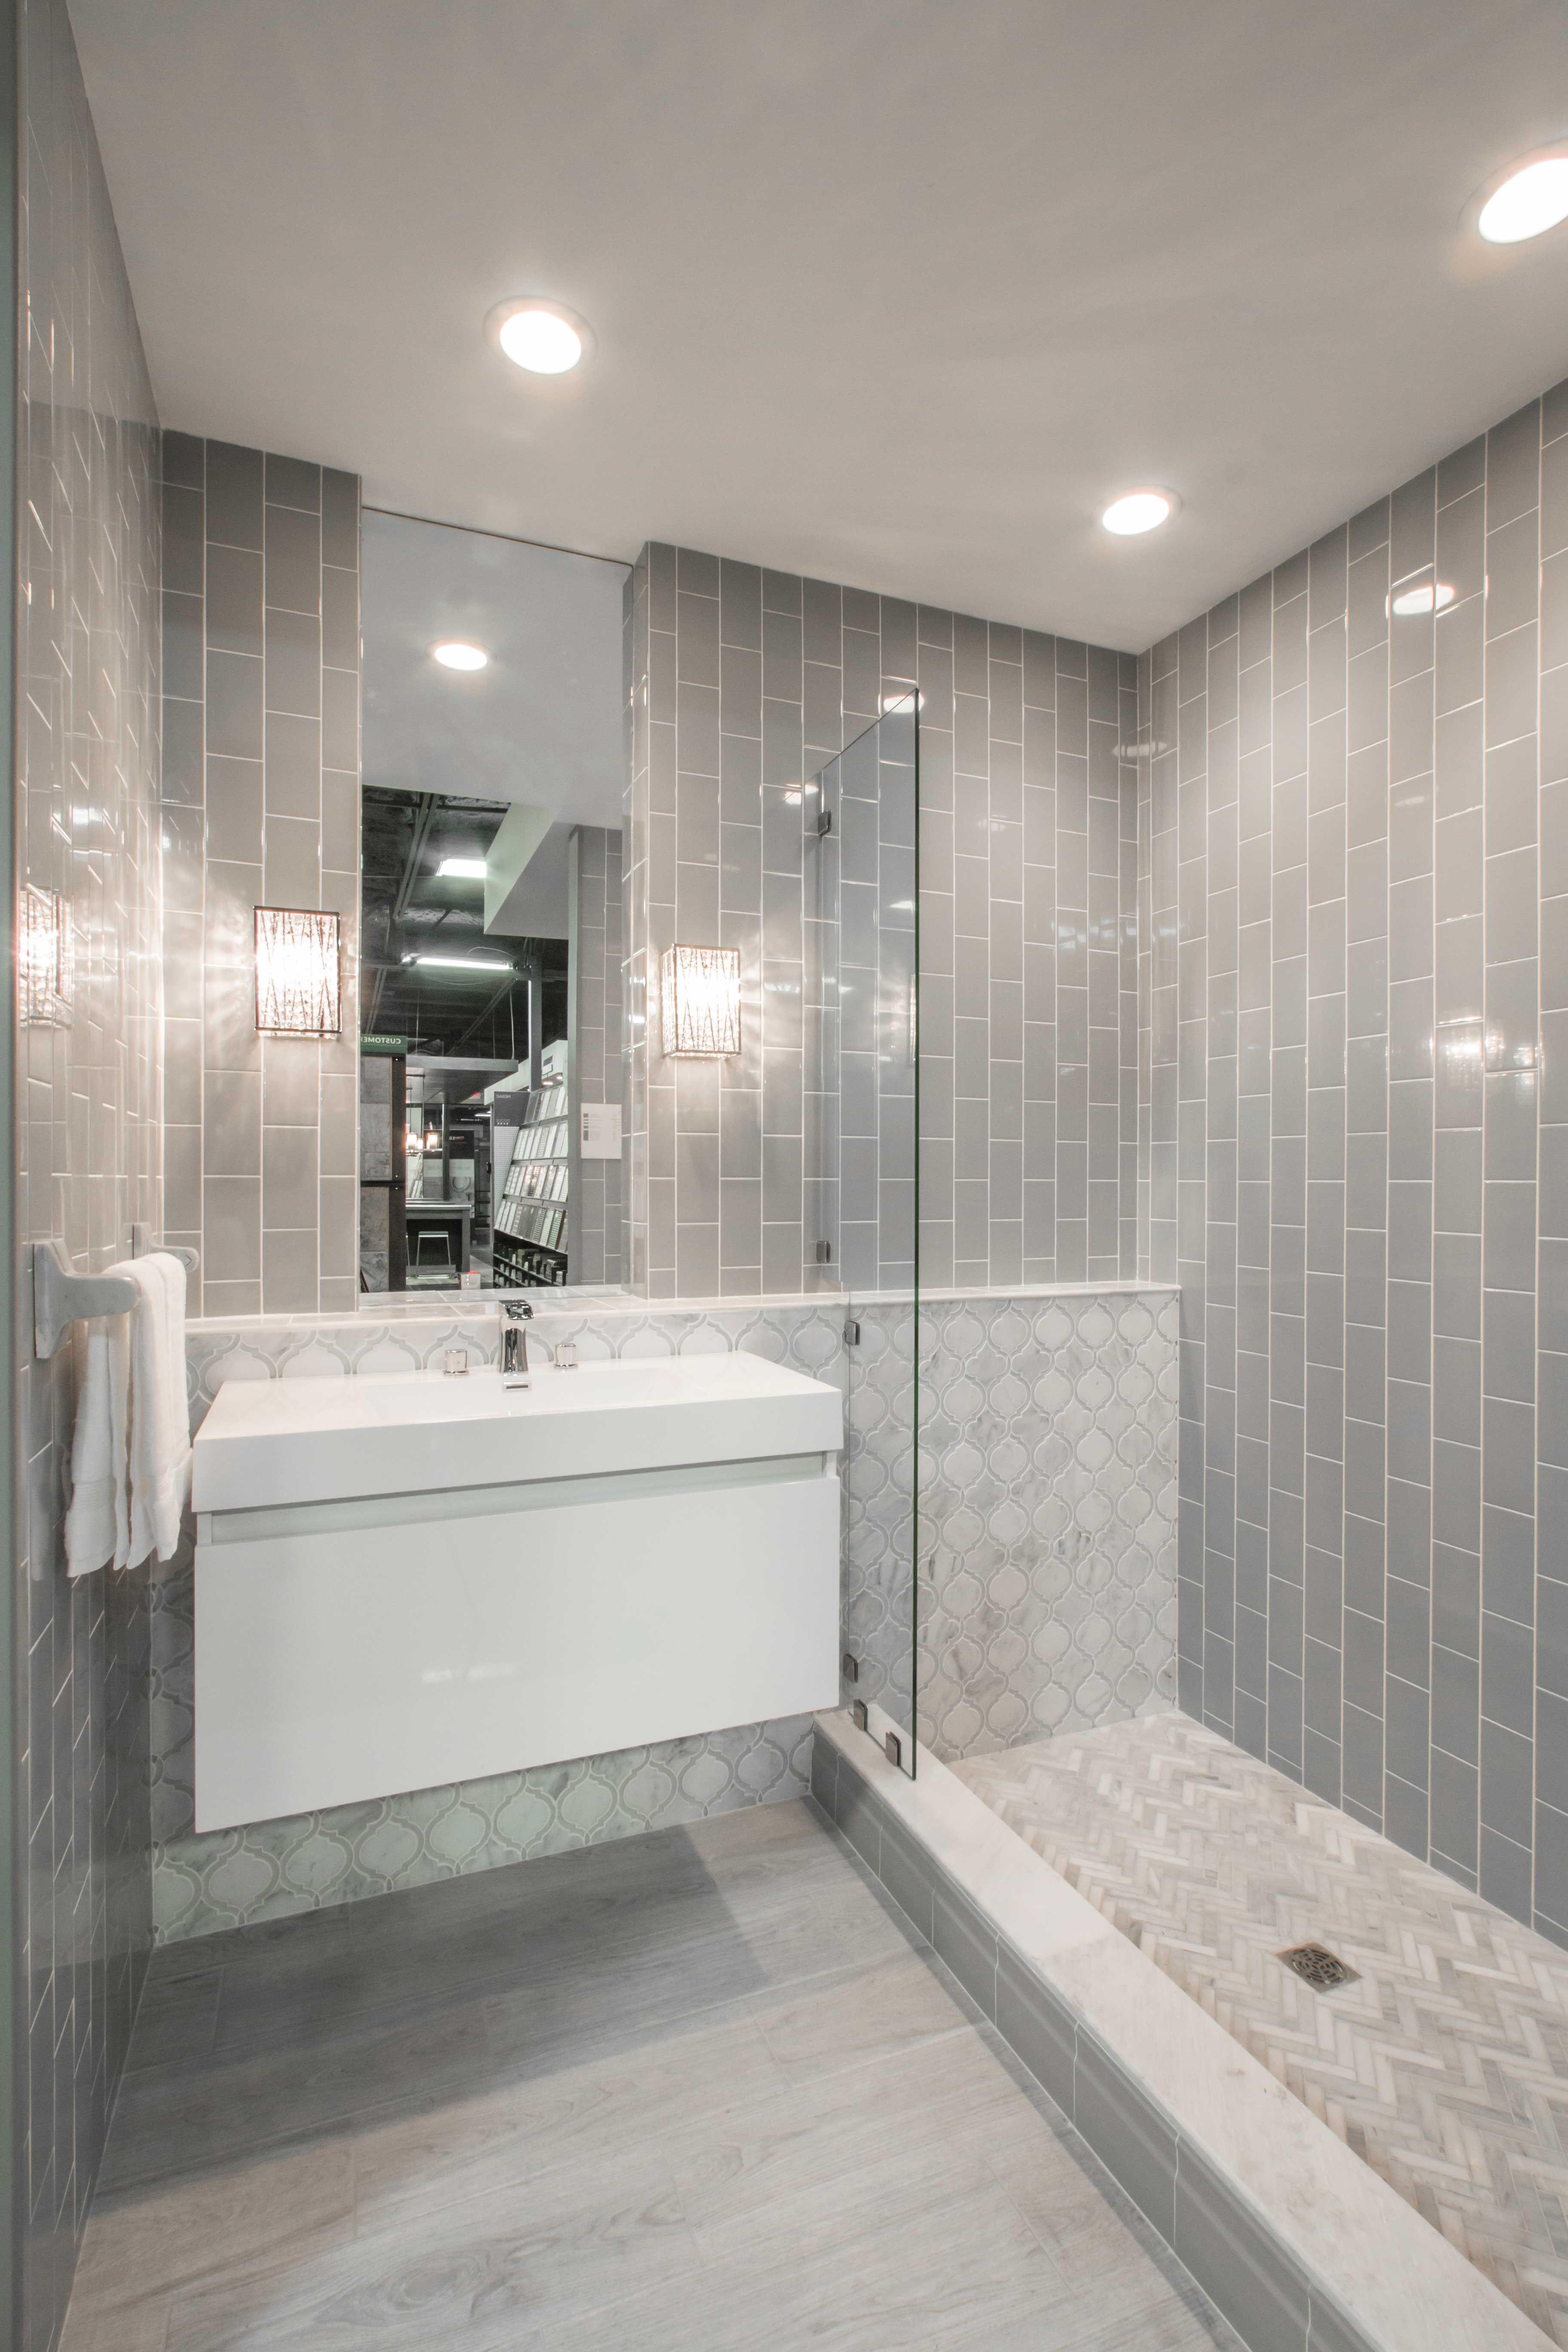 Pin By Sabrina Simmons On Bathrooms Grey Bathrooms